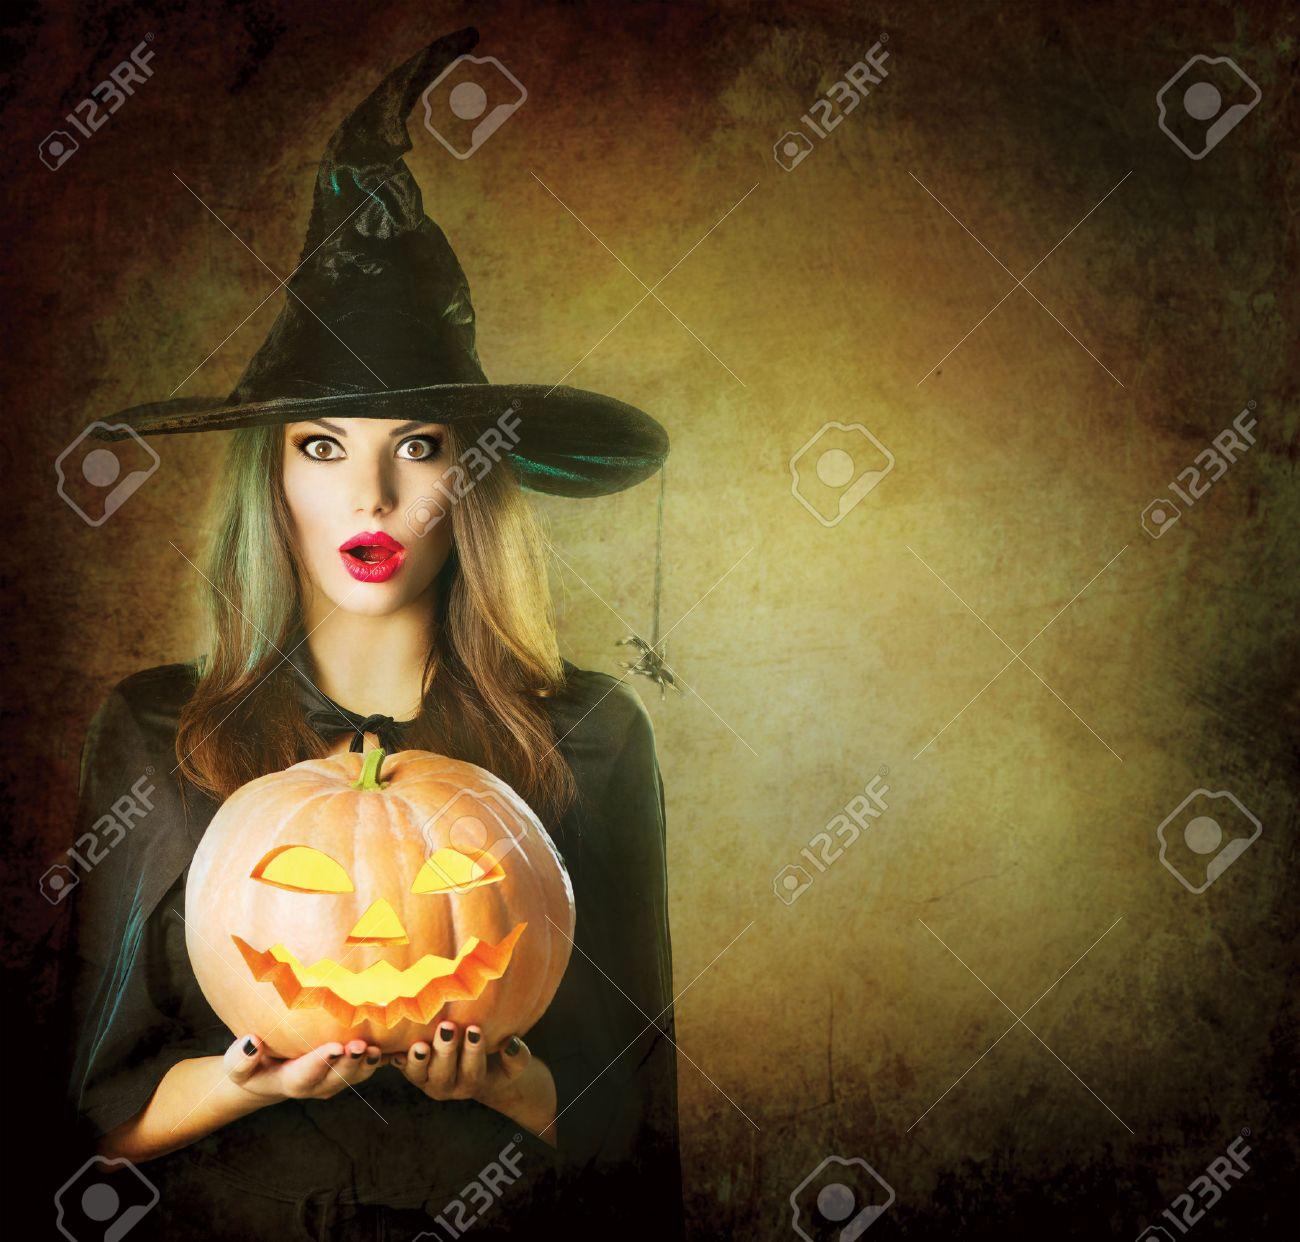 Halloween Witch holding carved Jack lantern pumpkin - 46883619